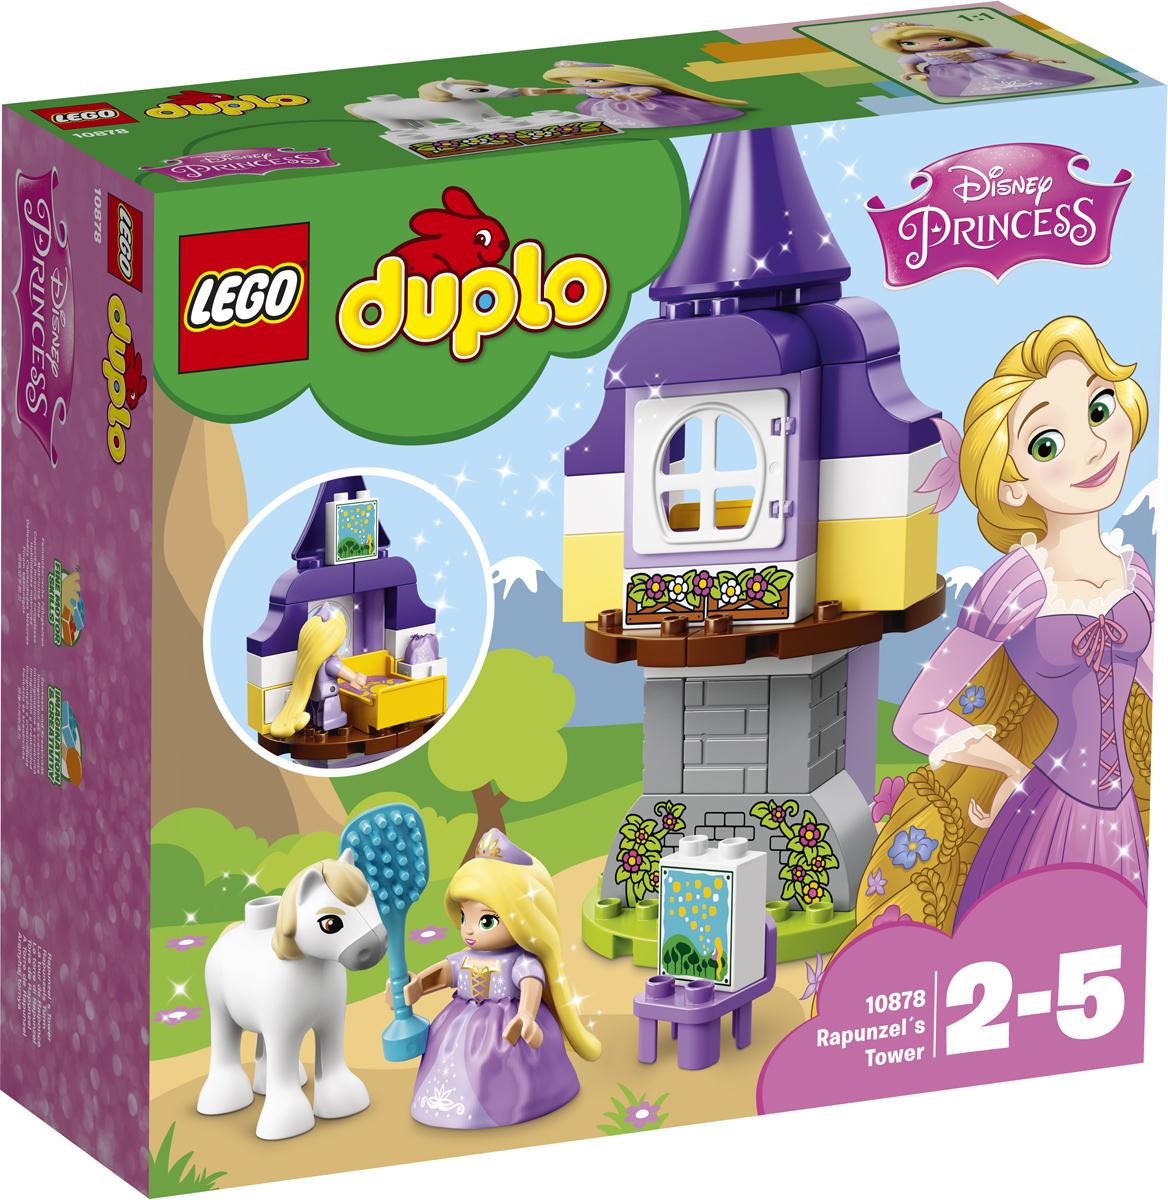 LEGO DUPLO Princess Конструктор Башня Рапунцель 10878 lego duplo my first конструктор мои первые домашние животные 10858